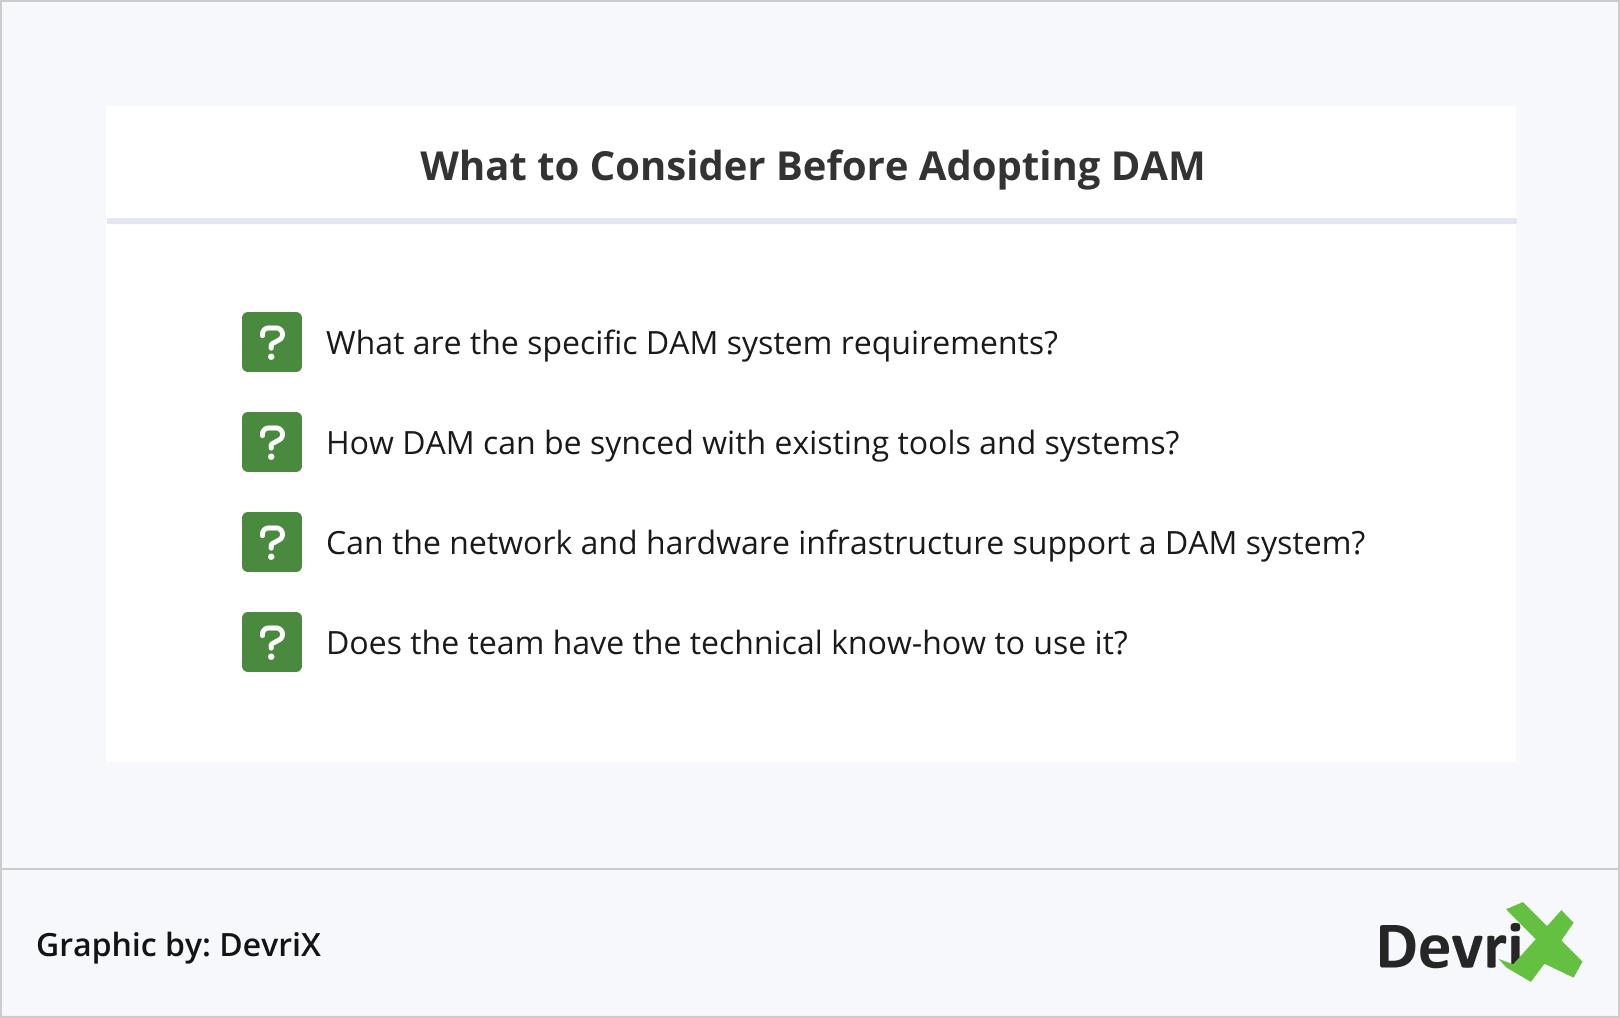 What to Consider Before Adopting DAM